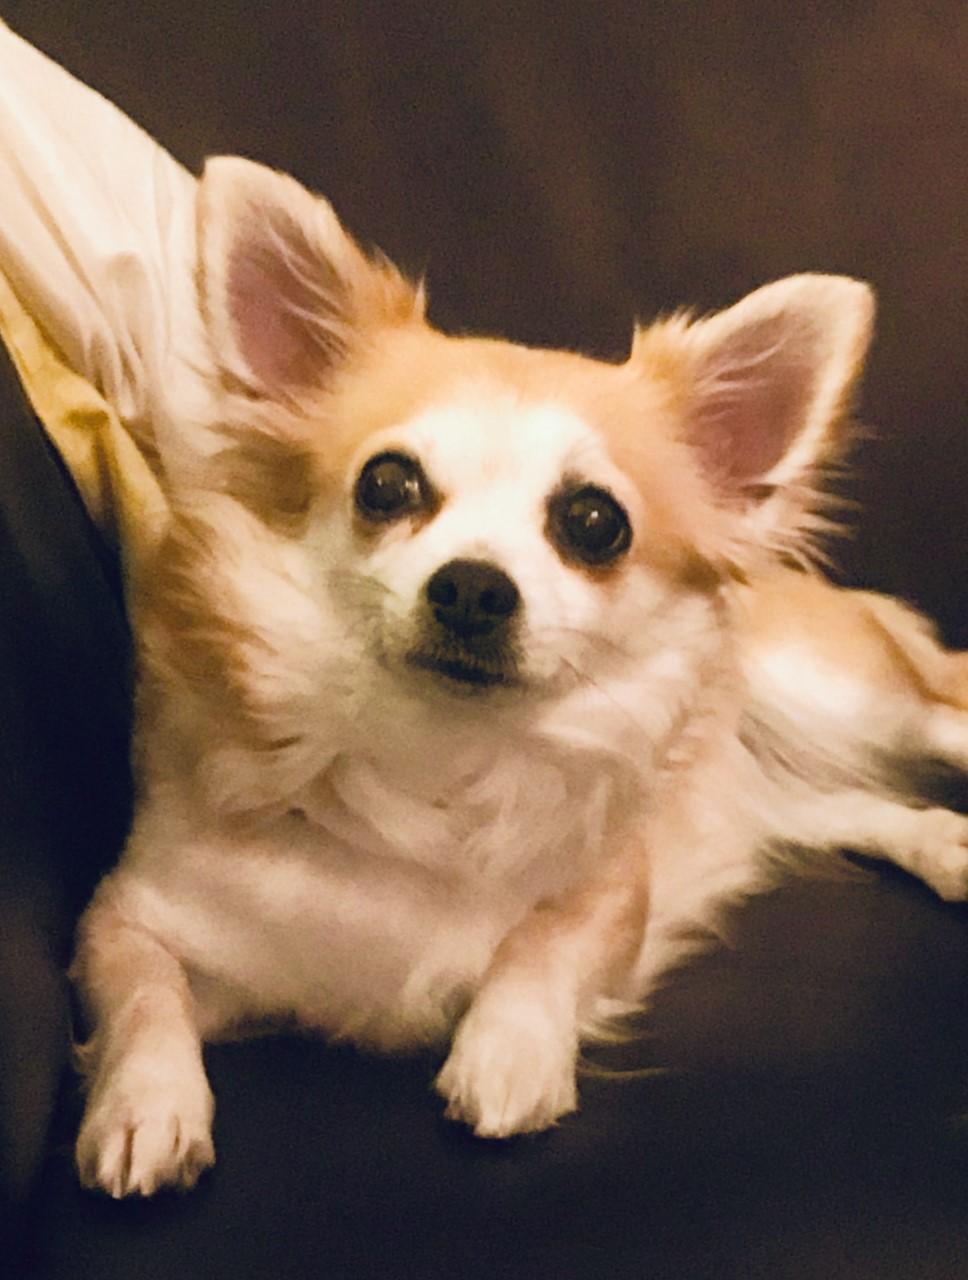 Chihuahua-langhåret